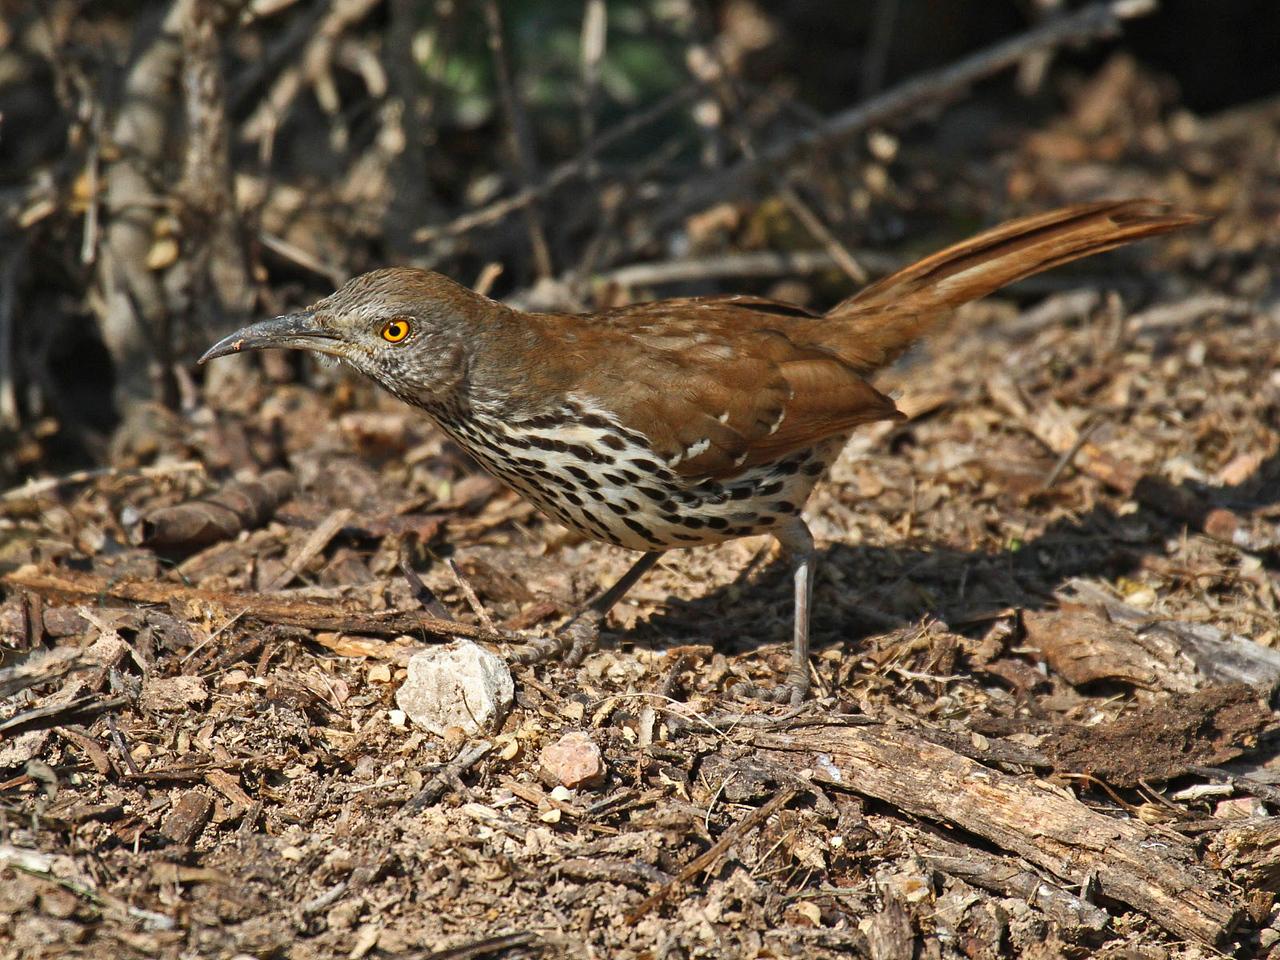 Long-billed Thrasher - Frontera Audubon Sanctuary